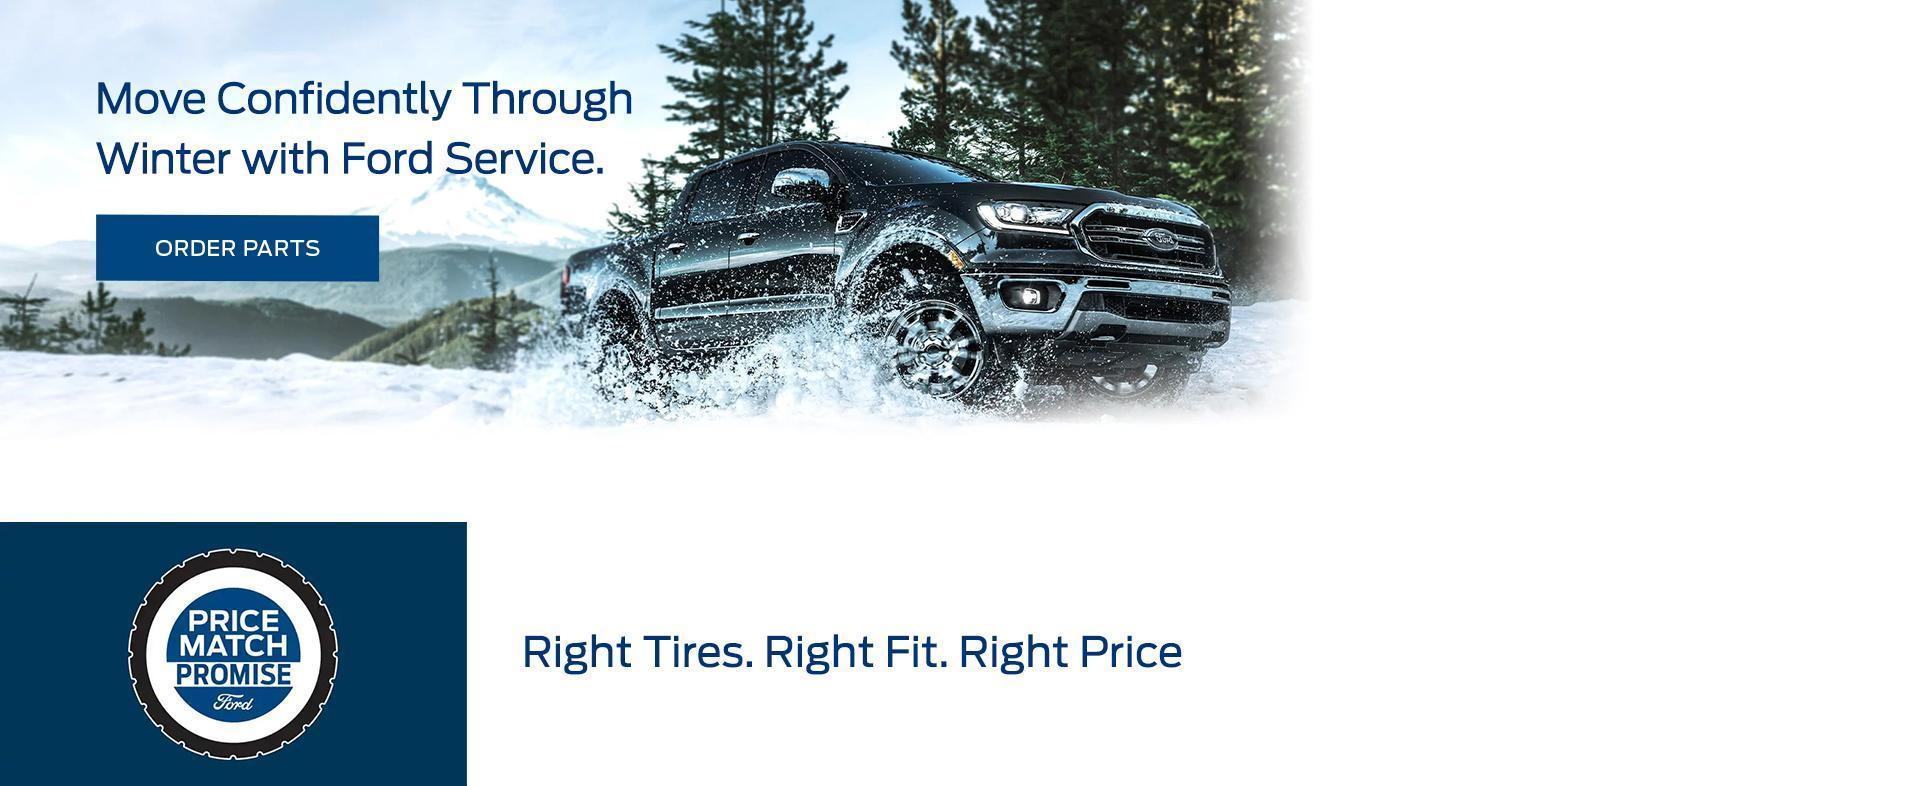 Price Match Tire Event Promo